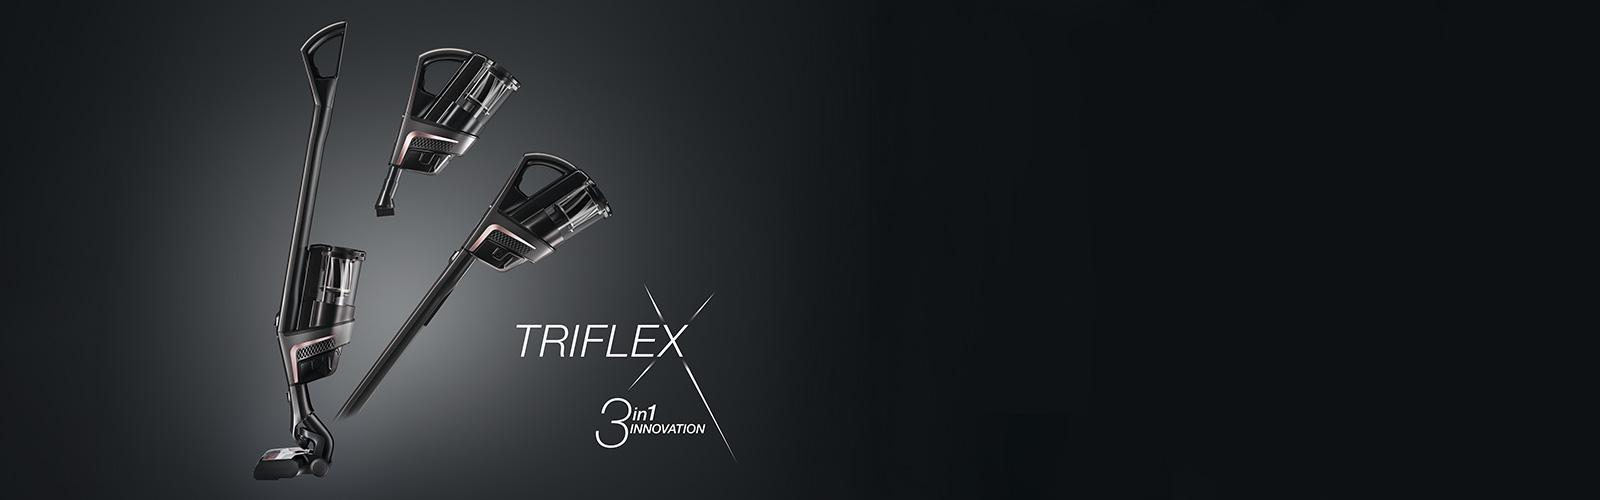 Nueva TriFlex HX1